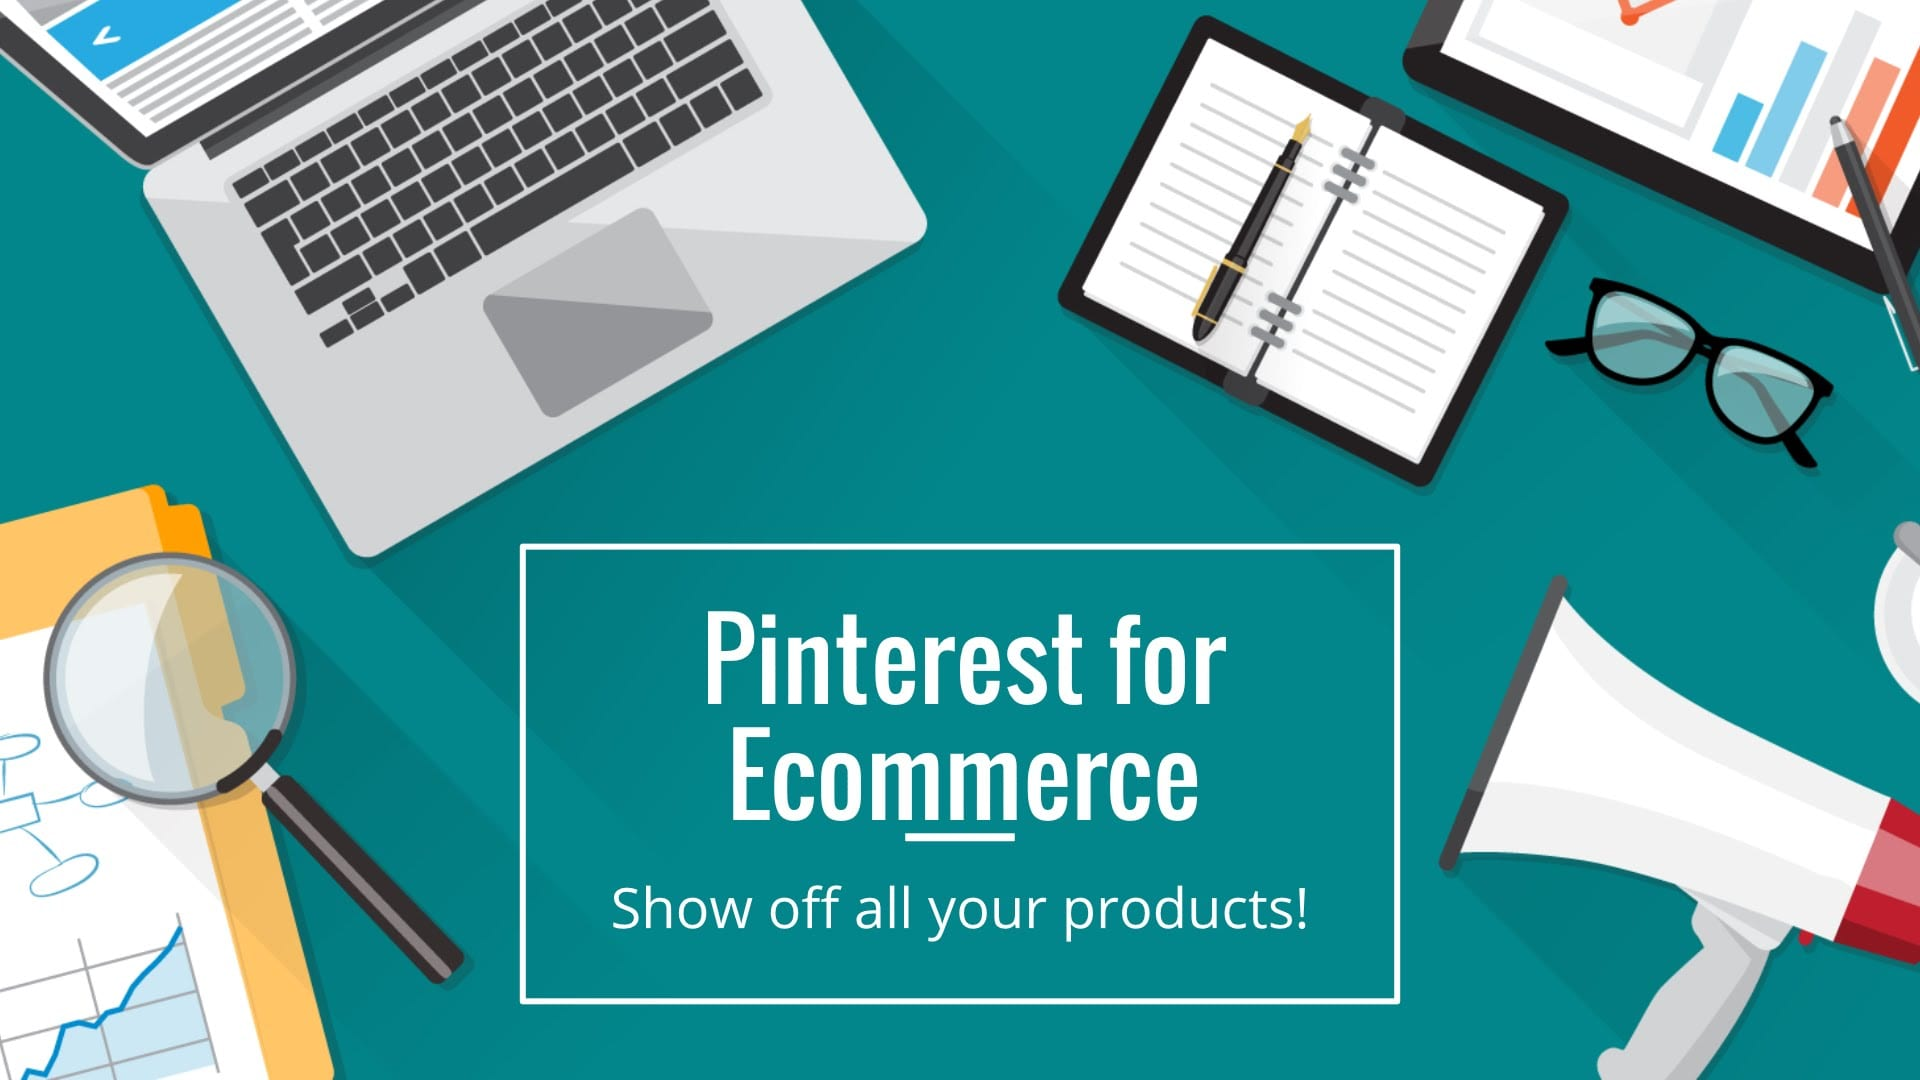 Pinterest con Ecommerce